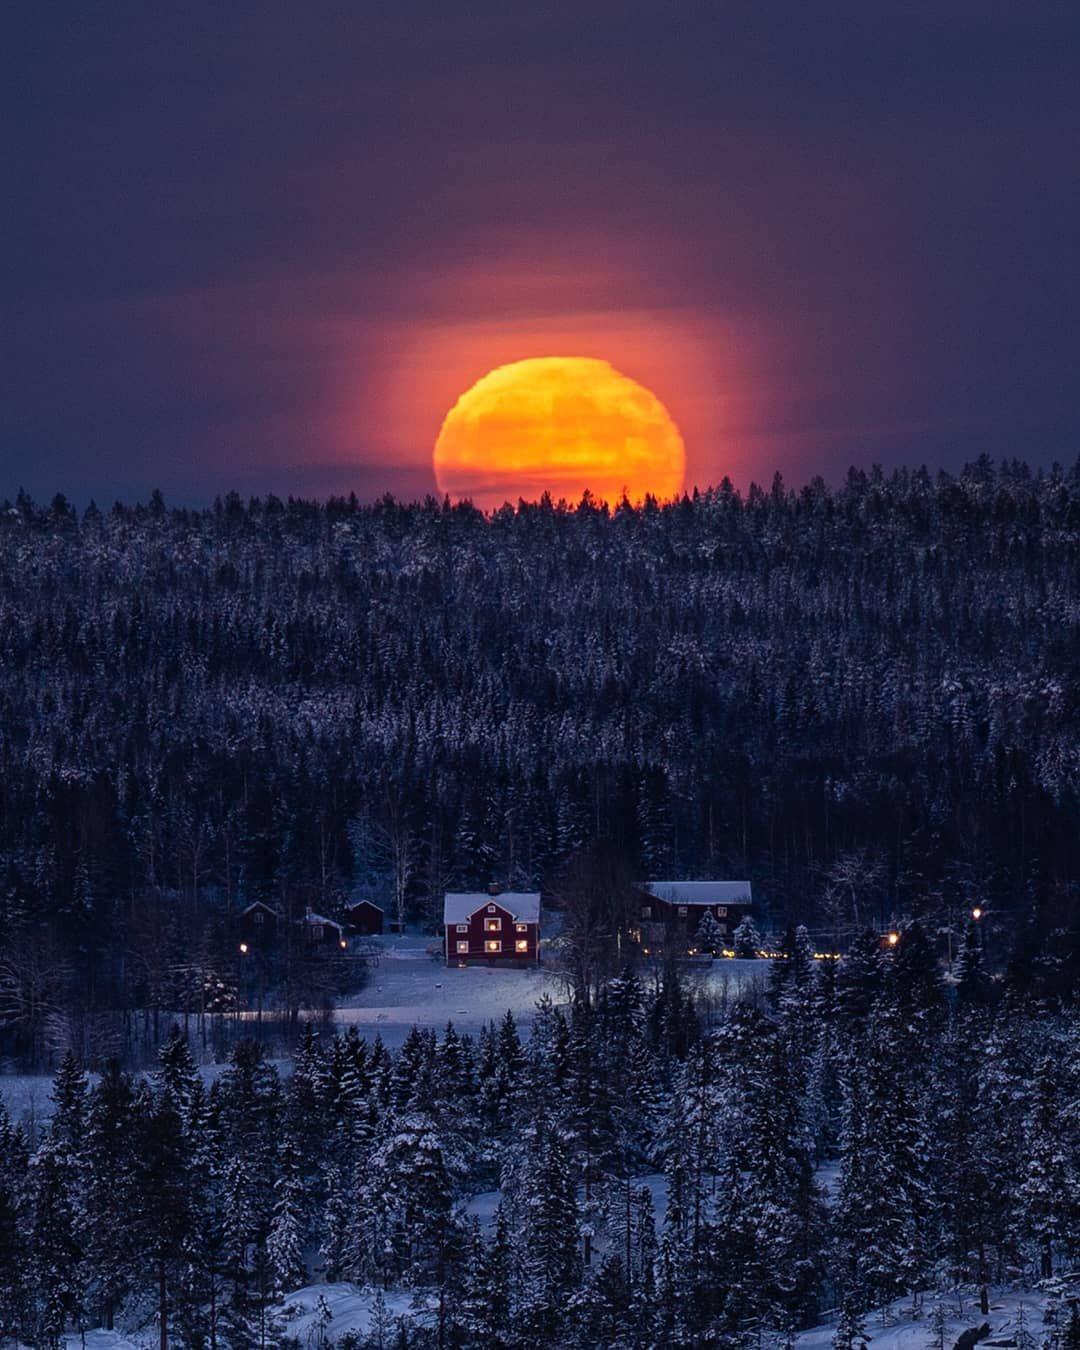 Lovely Sunset Credit Fotograf Mikael Jonsson Landscape Photography Winter Forest Nature Night Evening Dark Night Photography Night Photos Instagram